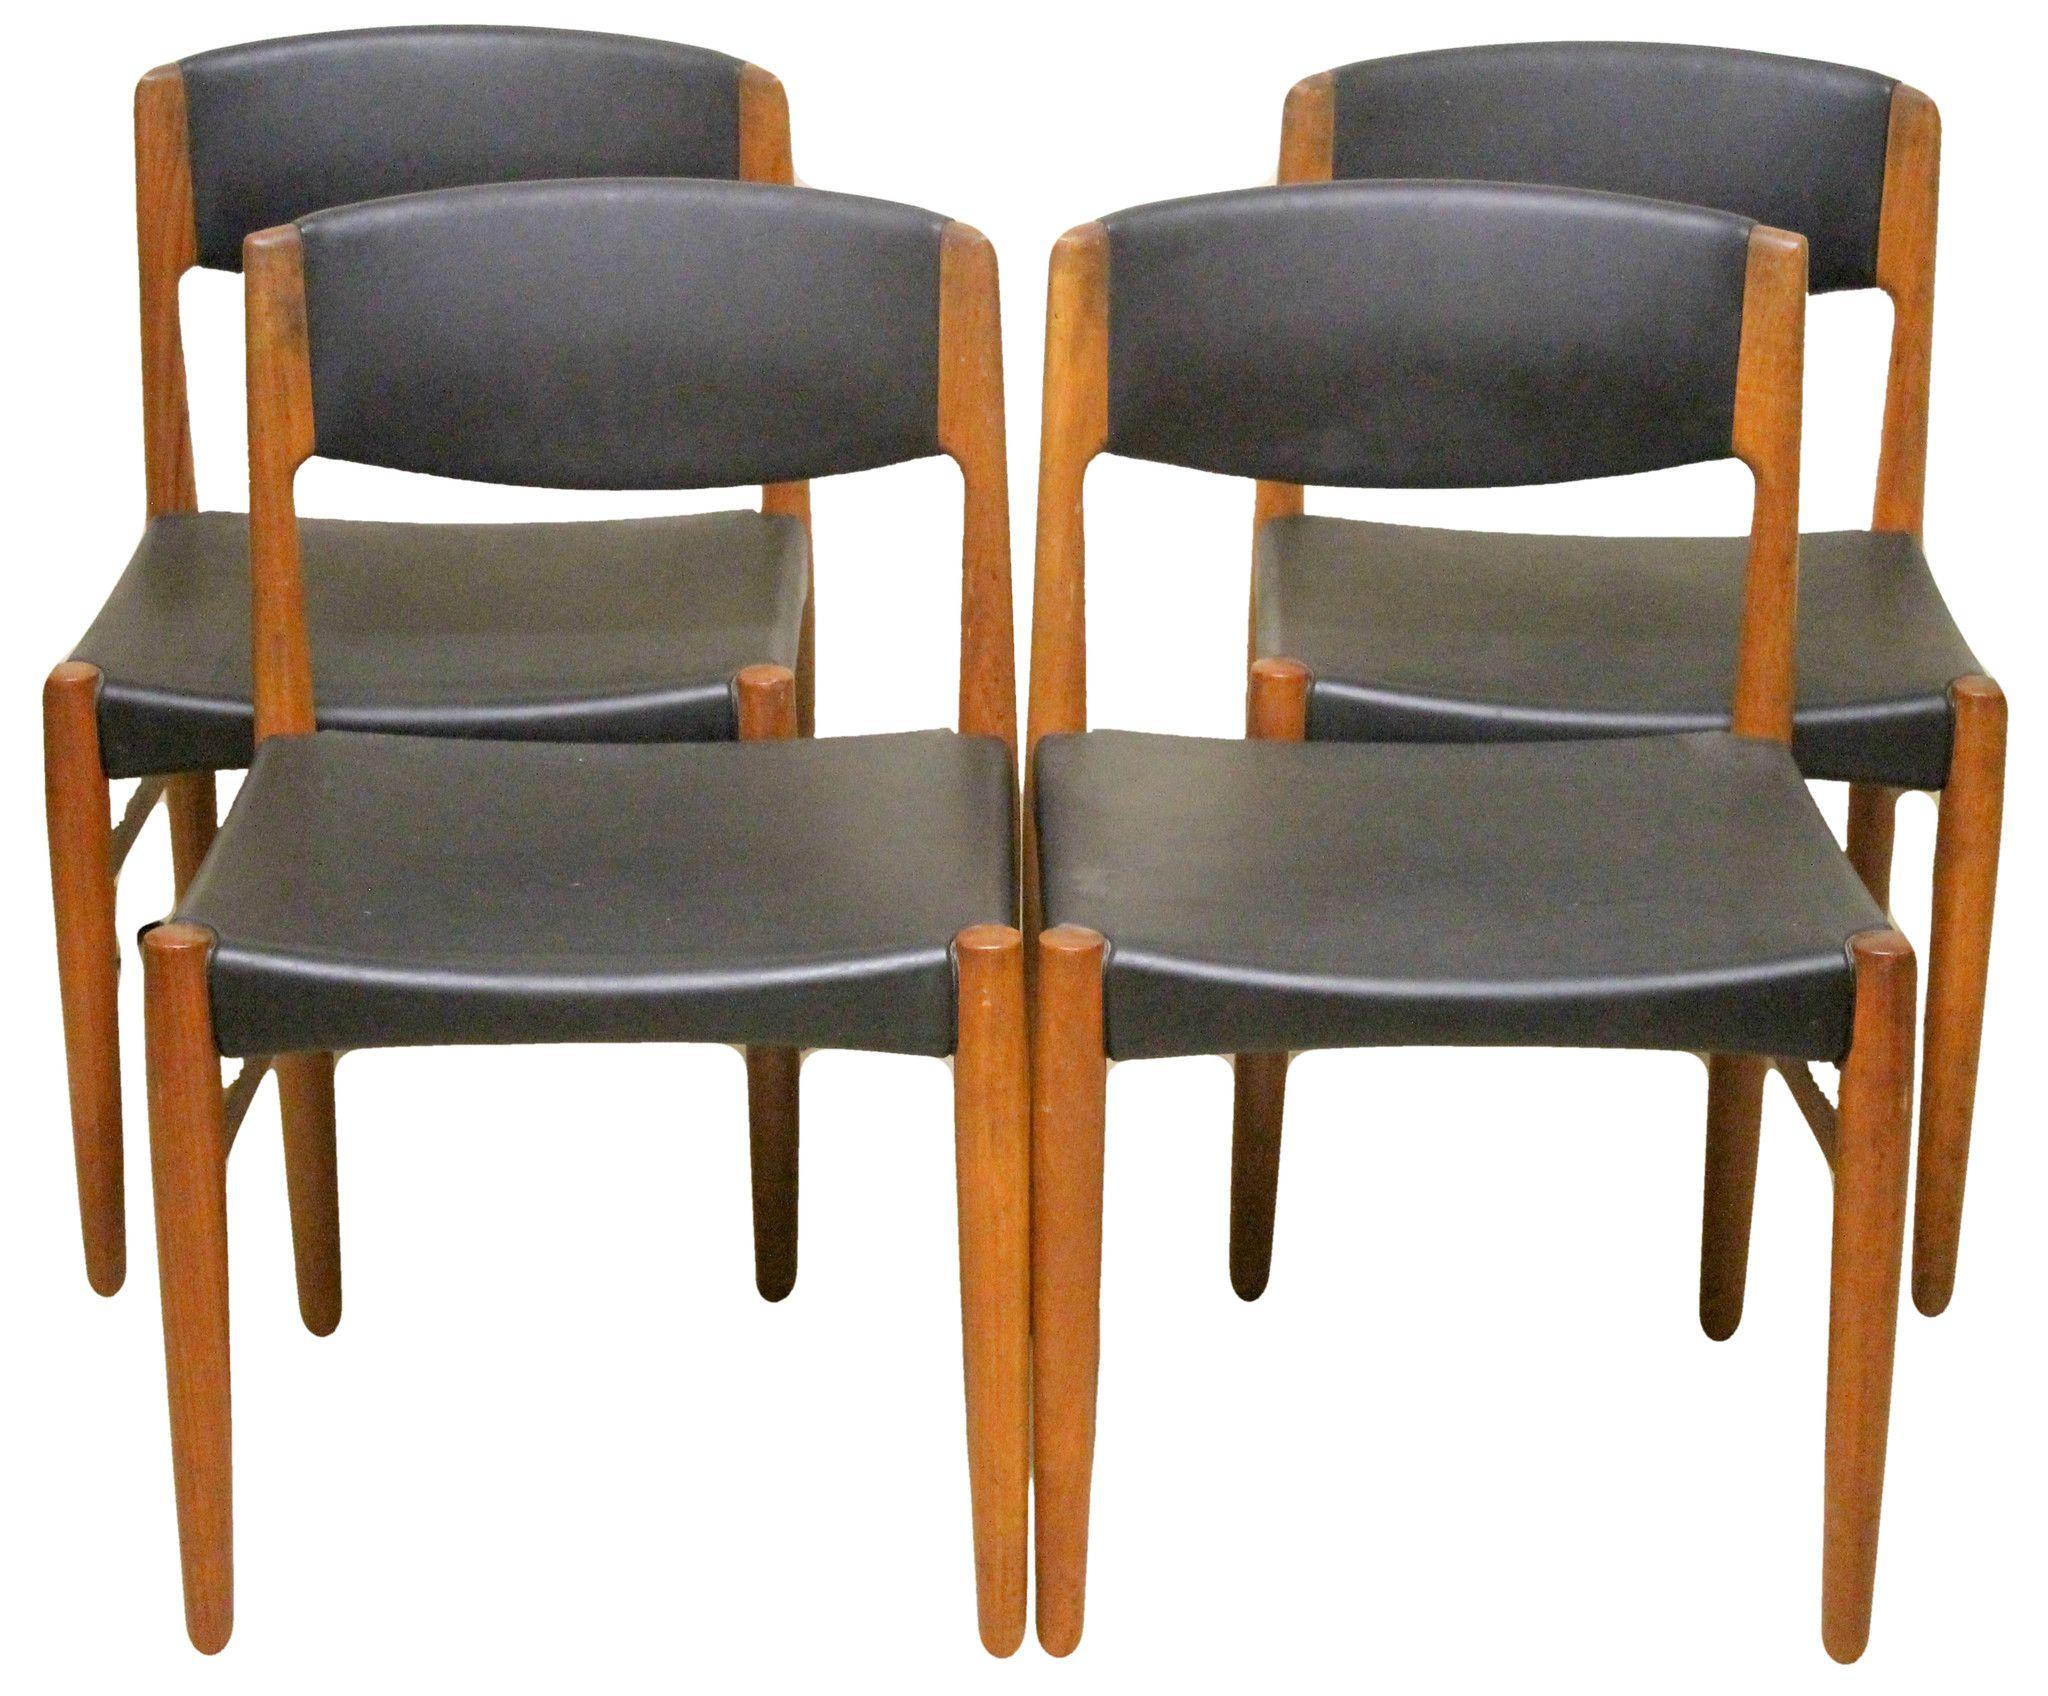 Set of Four Glostrup Mobelfabrik Mid Century Modern Dining Chair